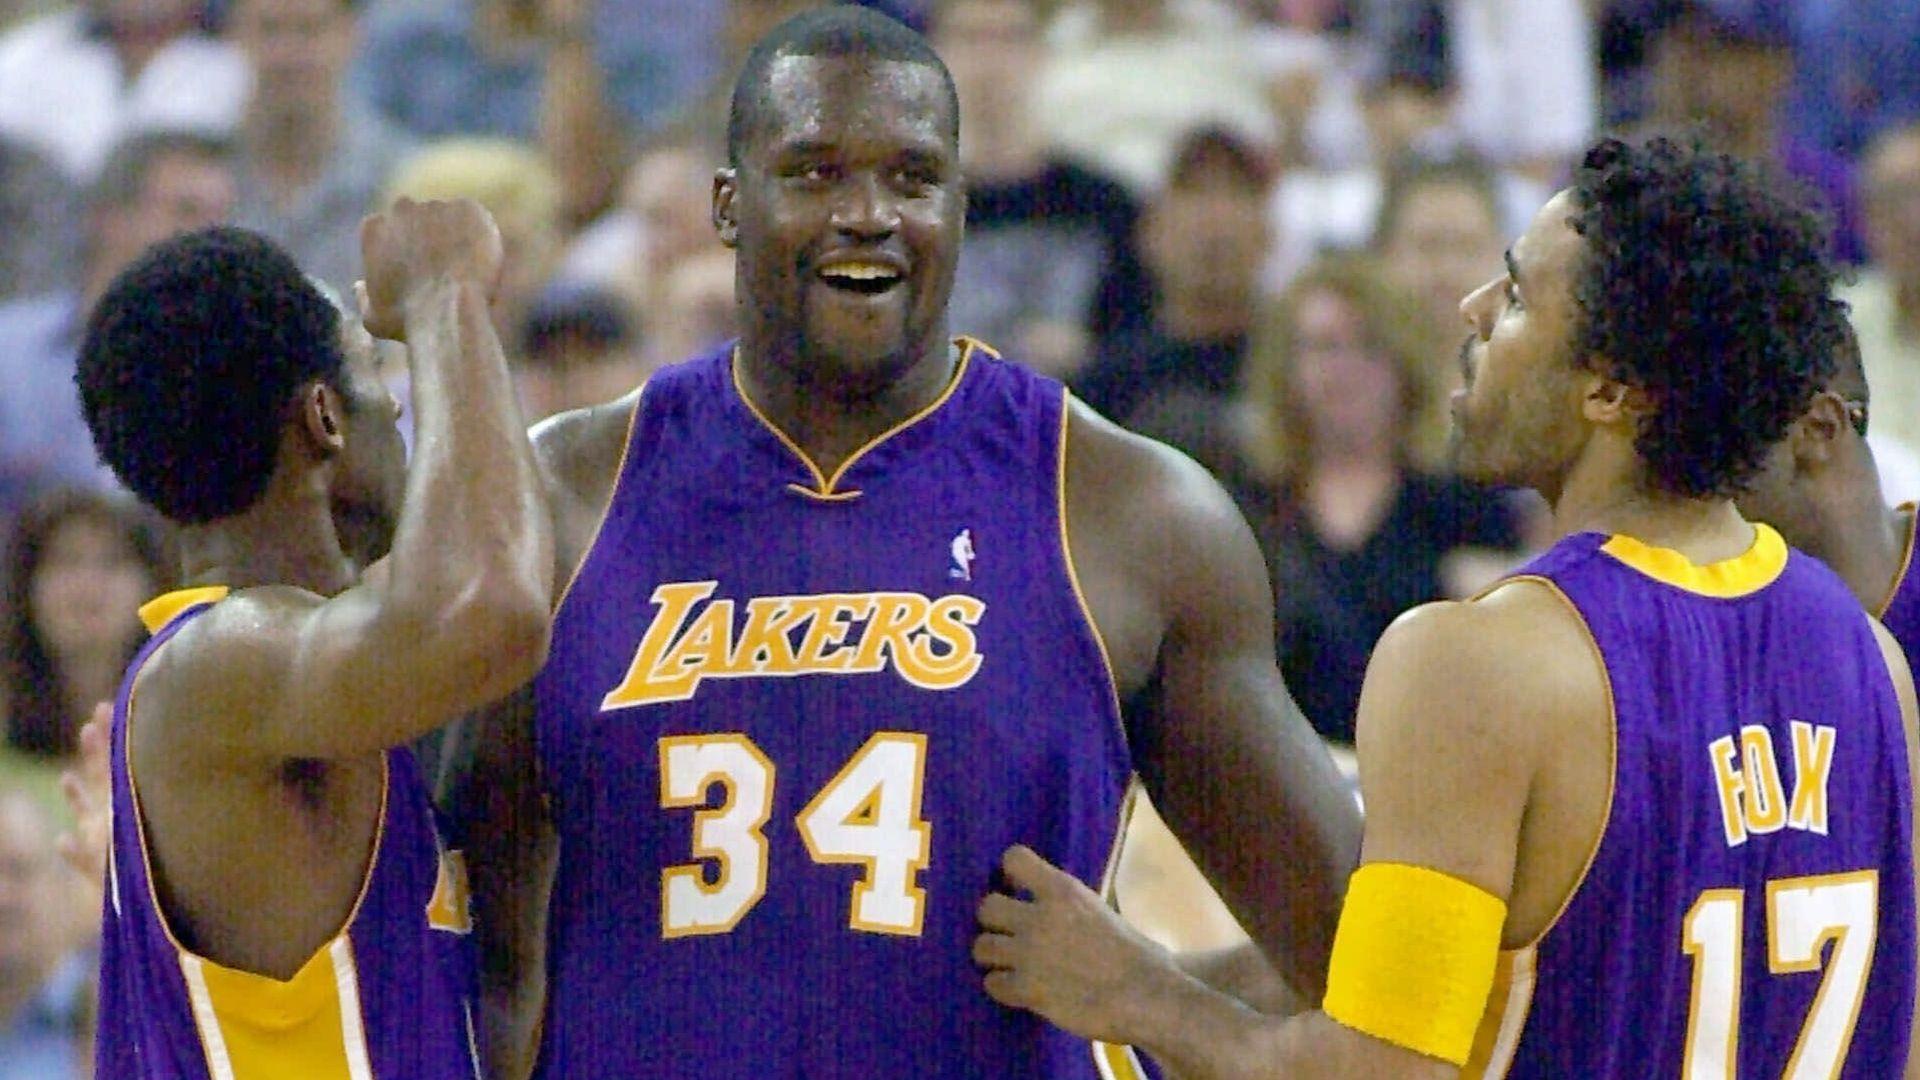 https://secure.espncdn.com/combiner/i?img=/media/motion/2016/0629/dm_160629_nba_shaq_son_college_basketball/dm_160629_nba_shaq_son_college_basketball.jpg